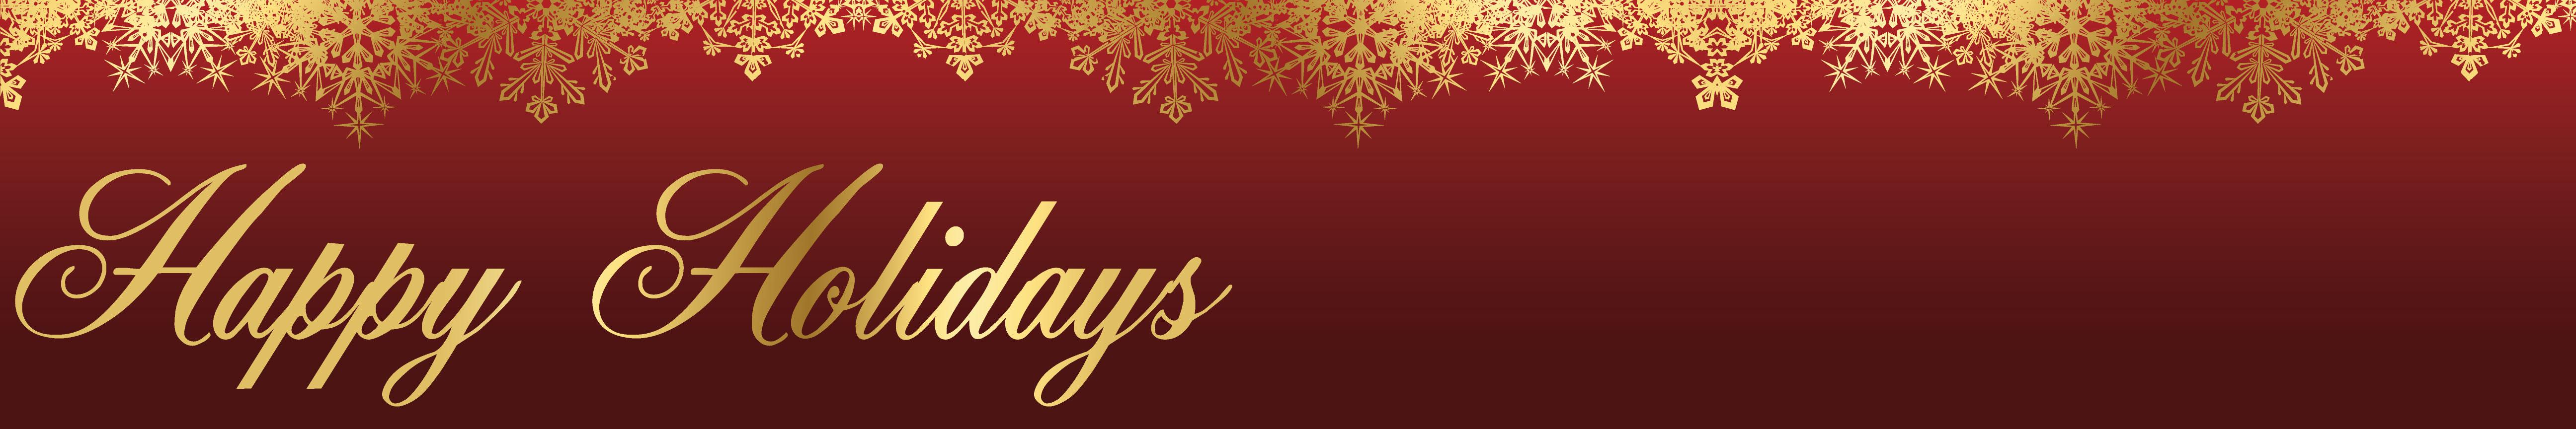 Happy Holidays Banner Design